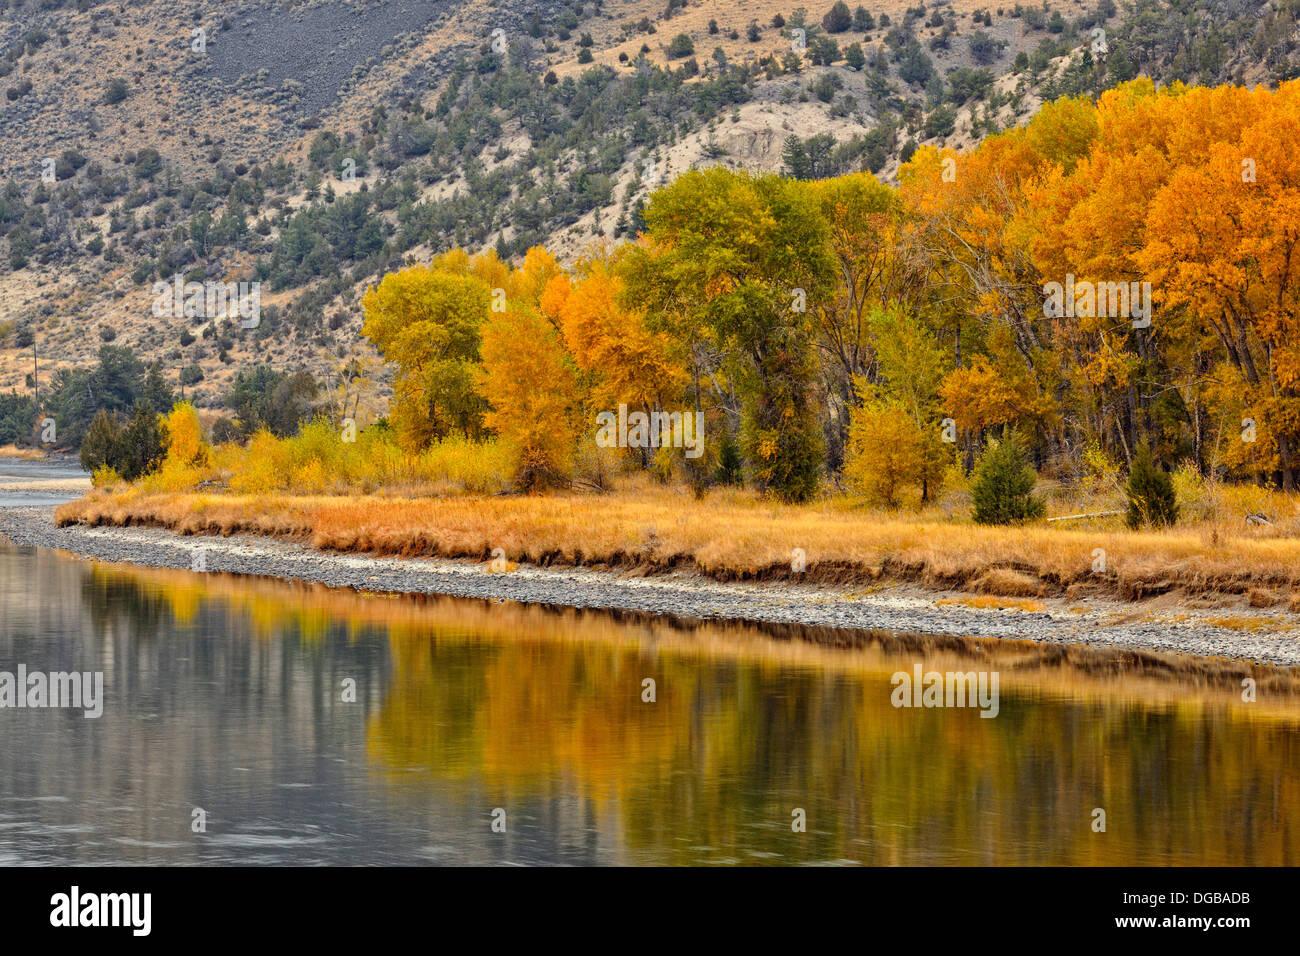 Autumn foliage on cottonwoods along the Yellowstone River near Livingston Montana USA - Stock Image